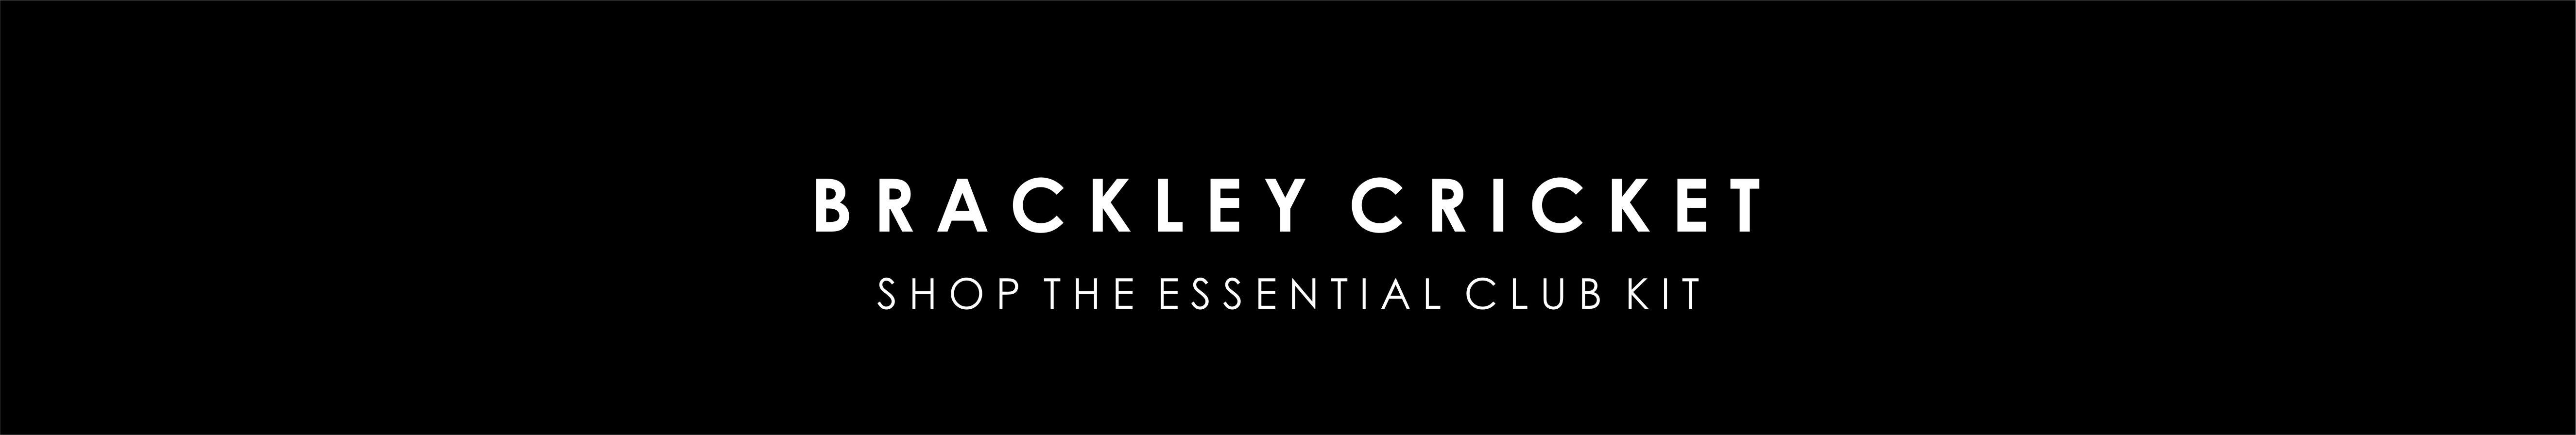 brackley-cricket-banner.jpg